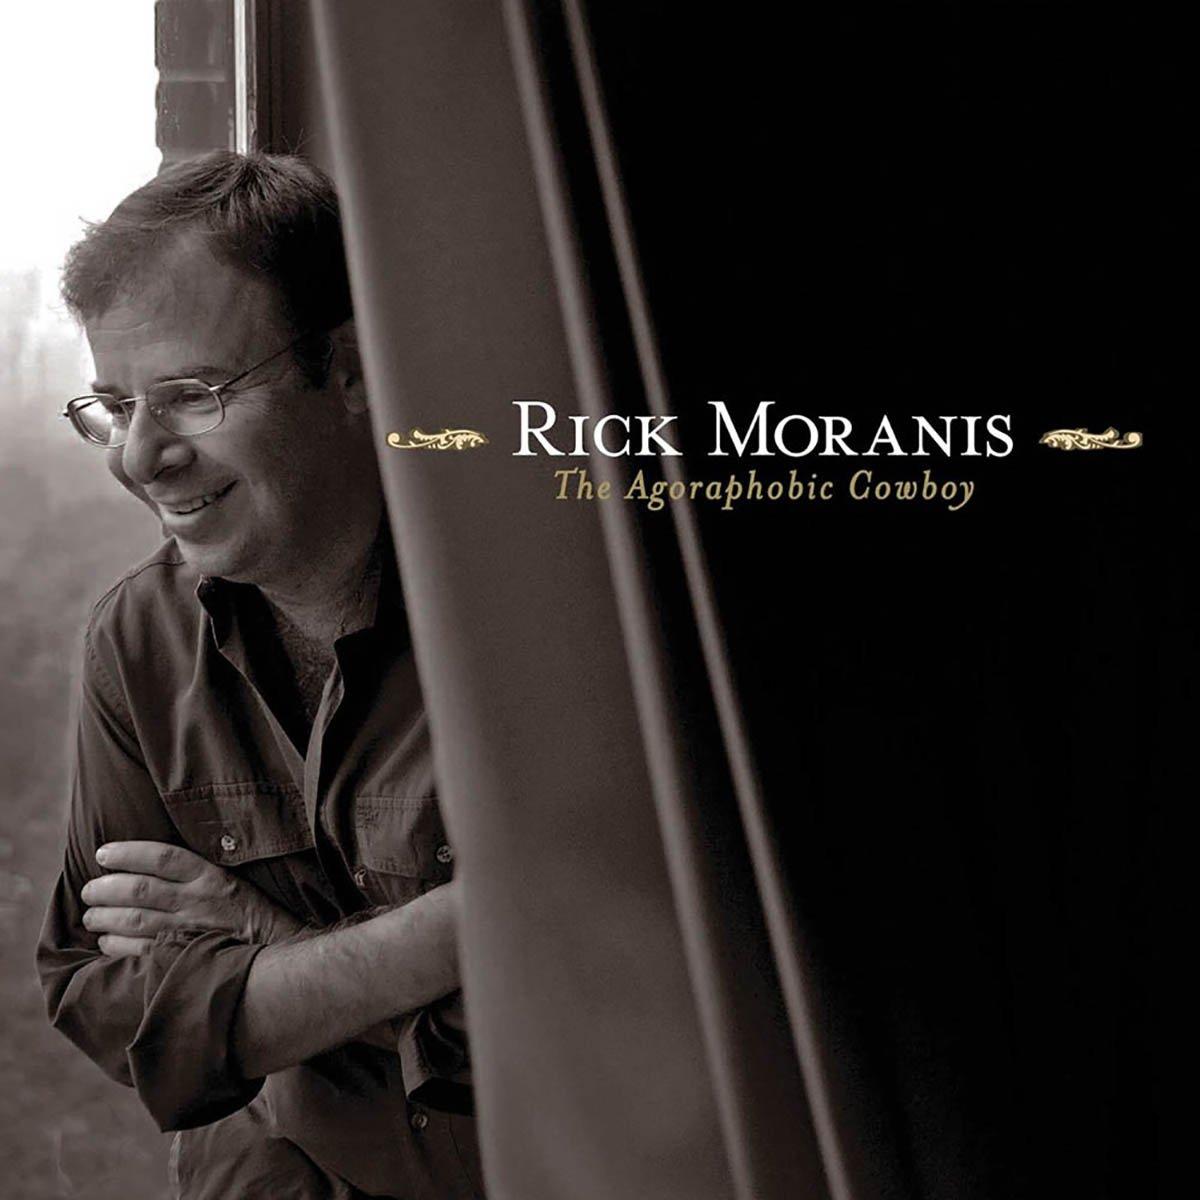 Rick Moranis, The Agoraphobic Cowboy